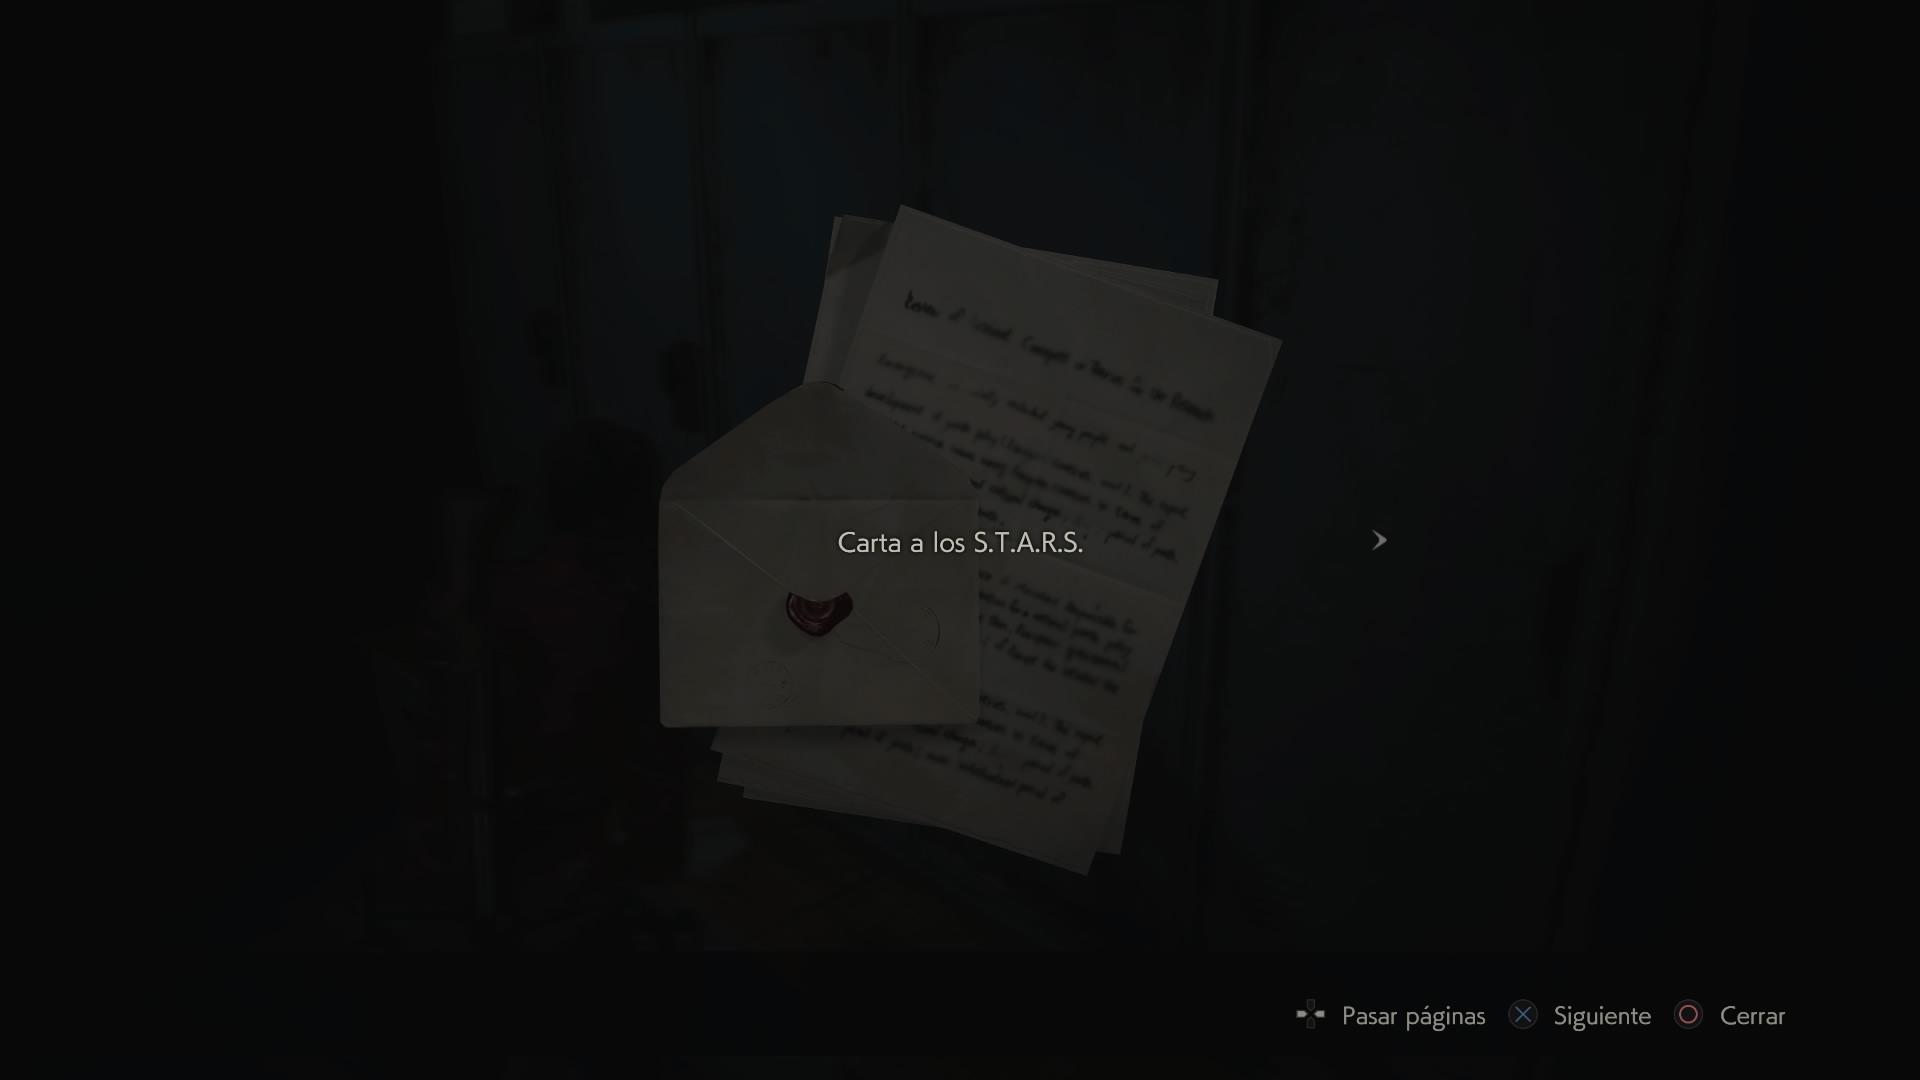 Carta a los S.T.A.R.S.